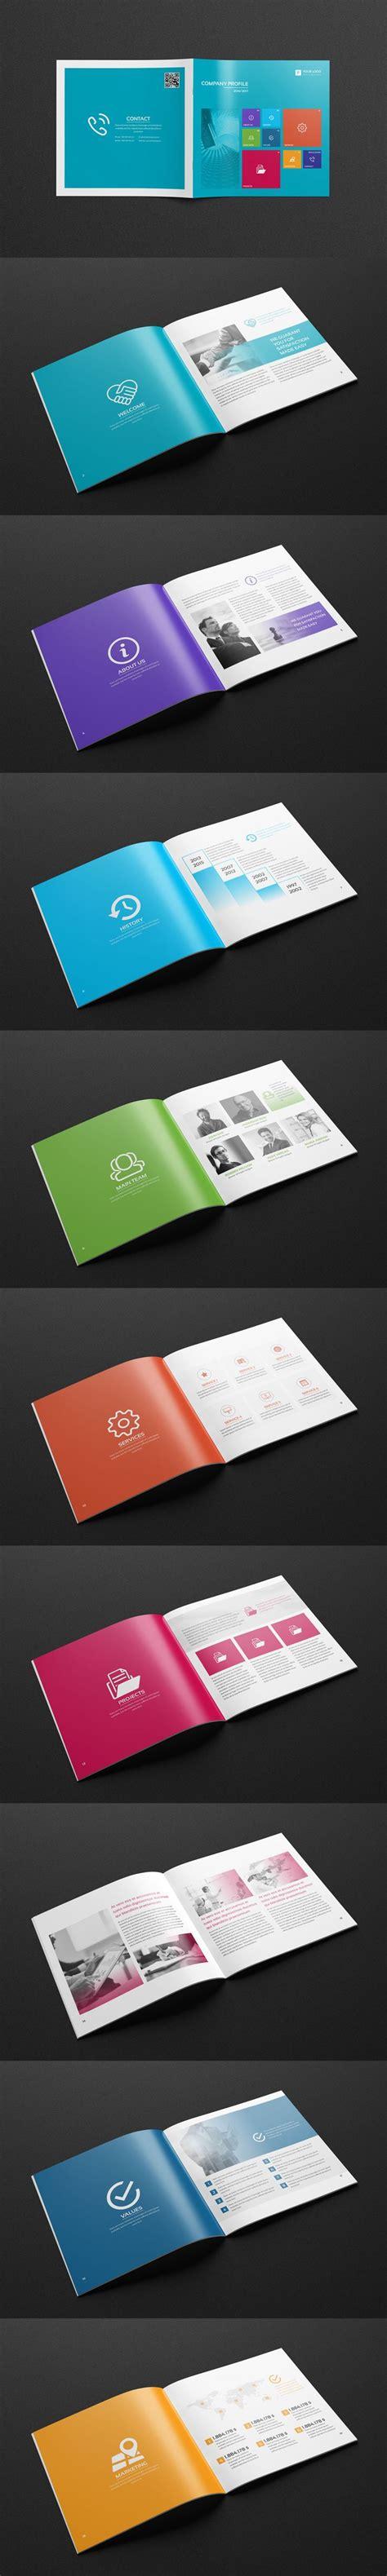 Company Profile Brochure Template Best 25 Company Profile Ideas On Company